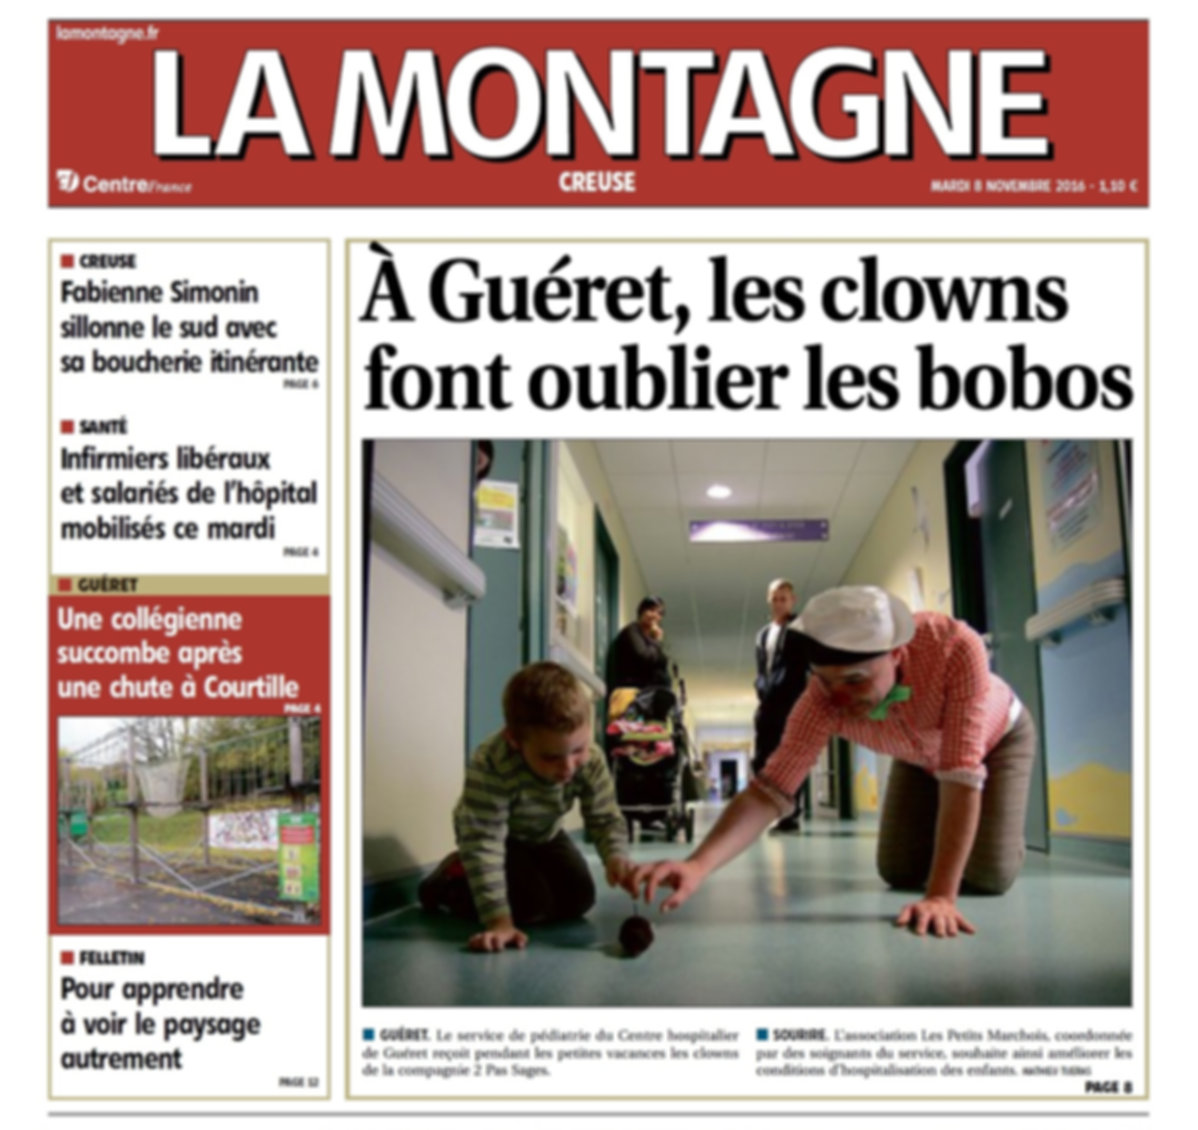 Clown hôpitaux Auvergne